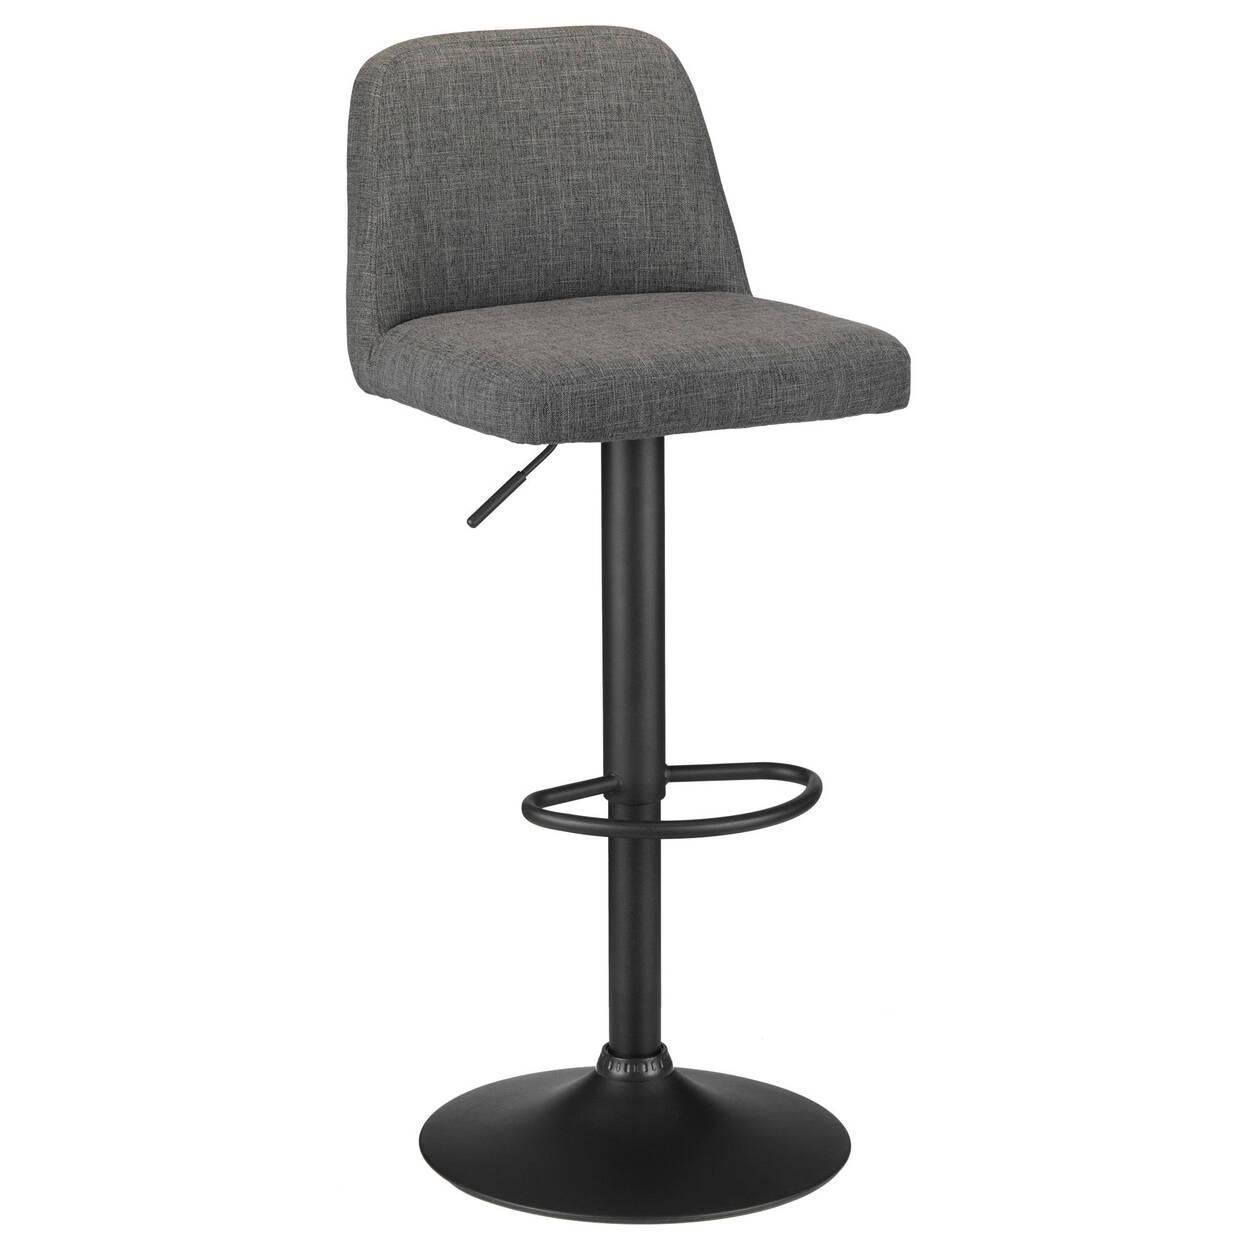 Peachy Chita Fabric And Metal Adjustable Bar Stool Short Links Chair Design For Home Short Linksinfo